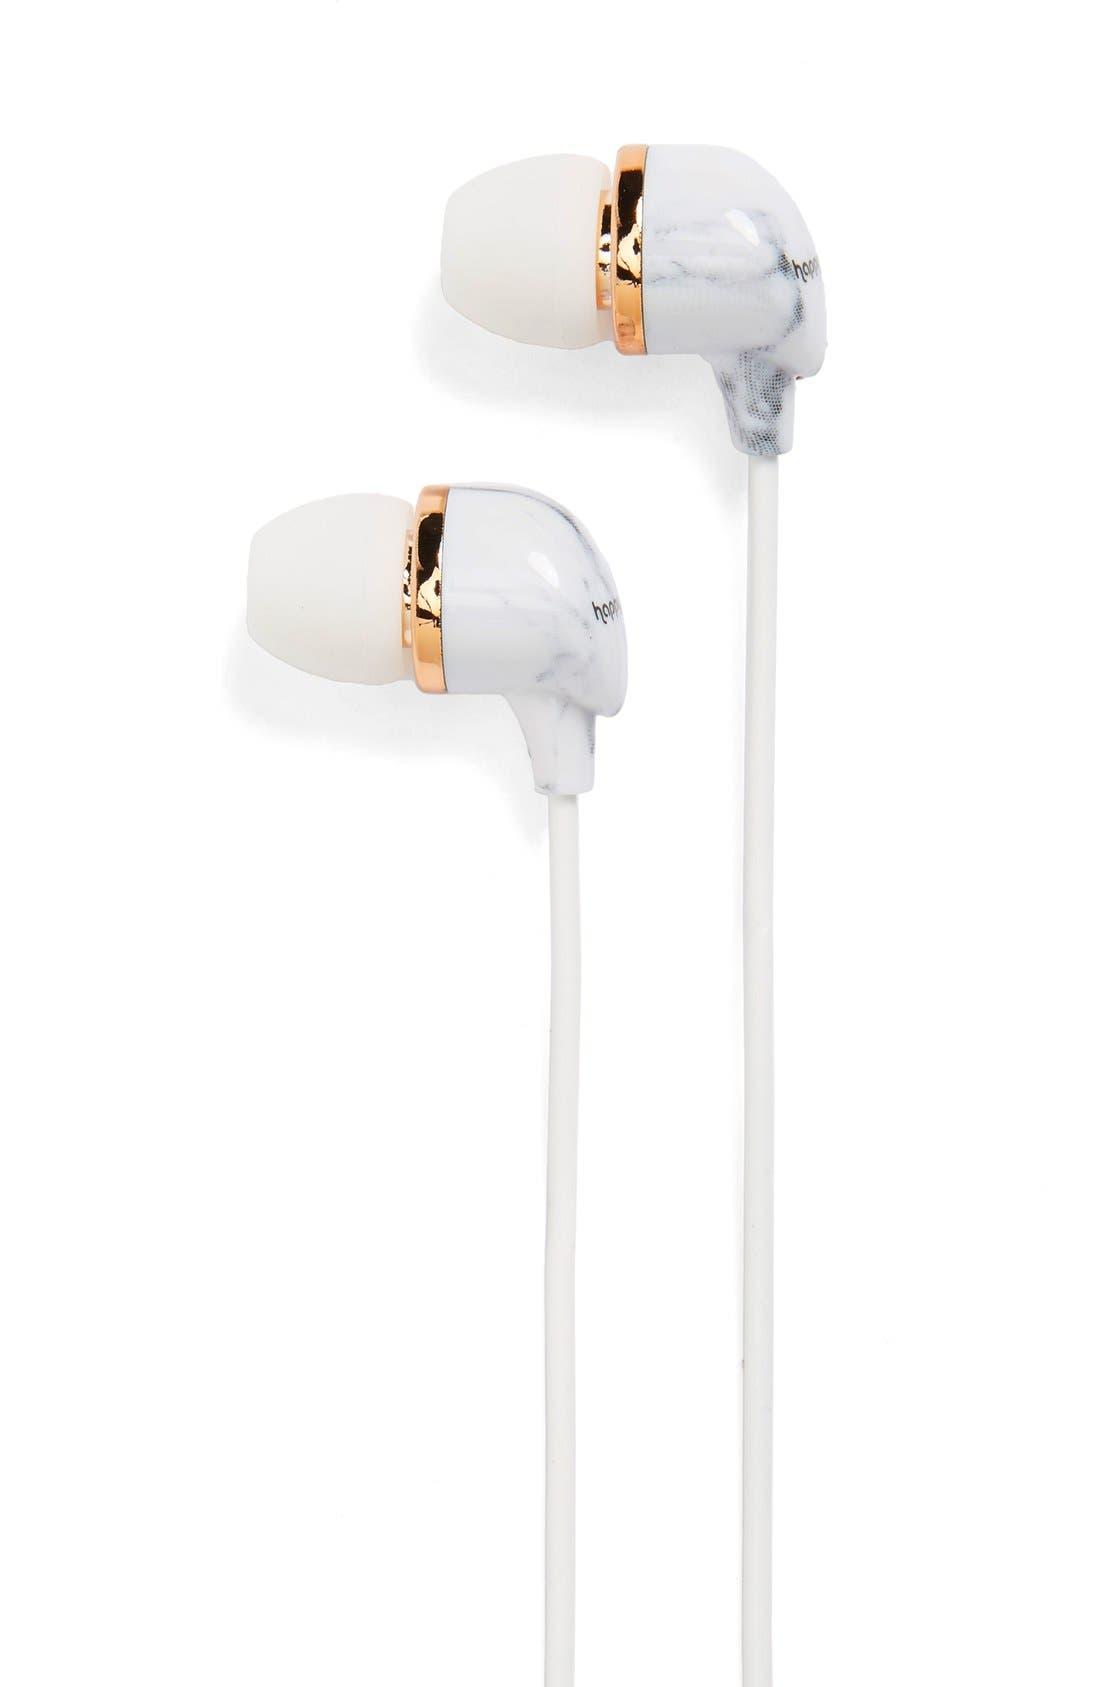 In-Ear Headphones,                             Main thumbnail 1, color,                             100